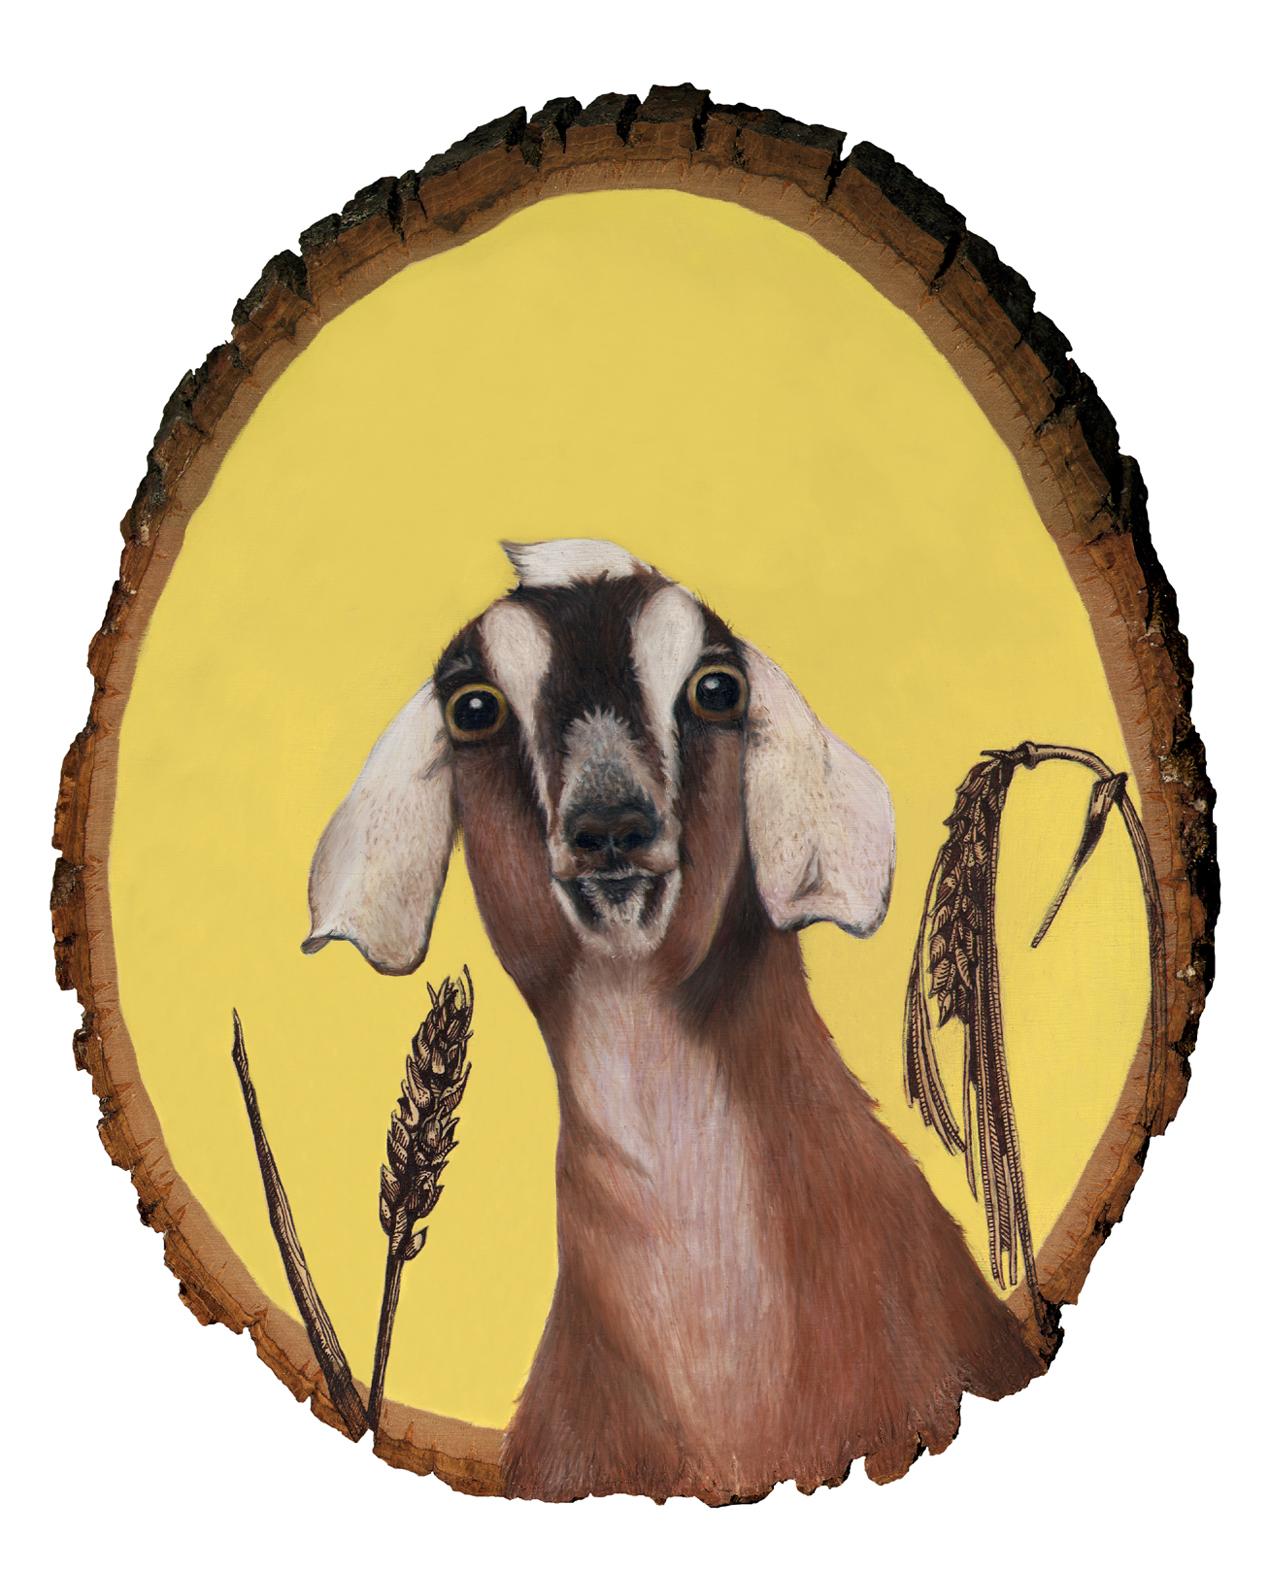 goat8x10.jpg